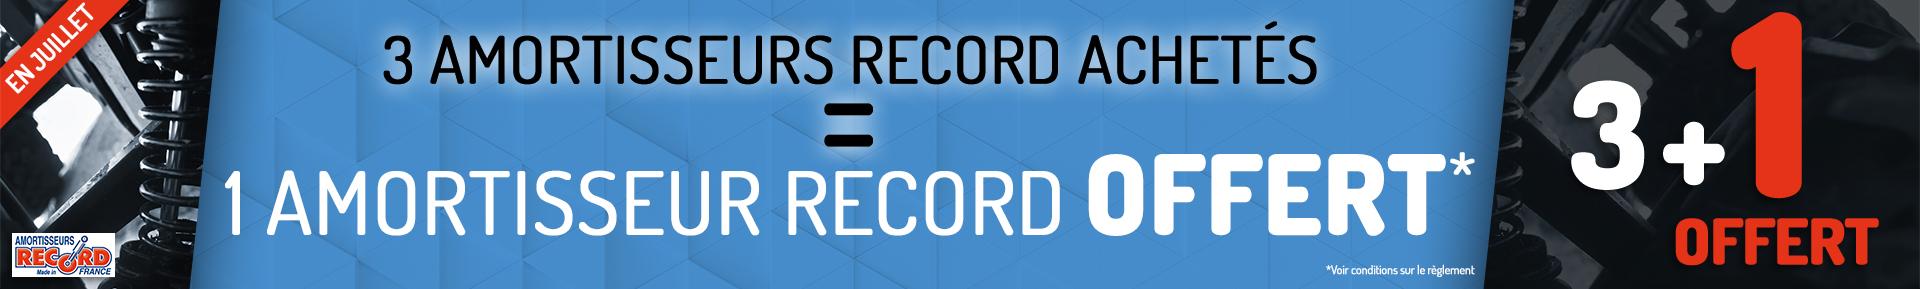 3 amortisseurs Record achetés = 1 amortisseur Record offert